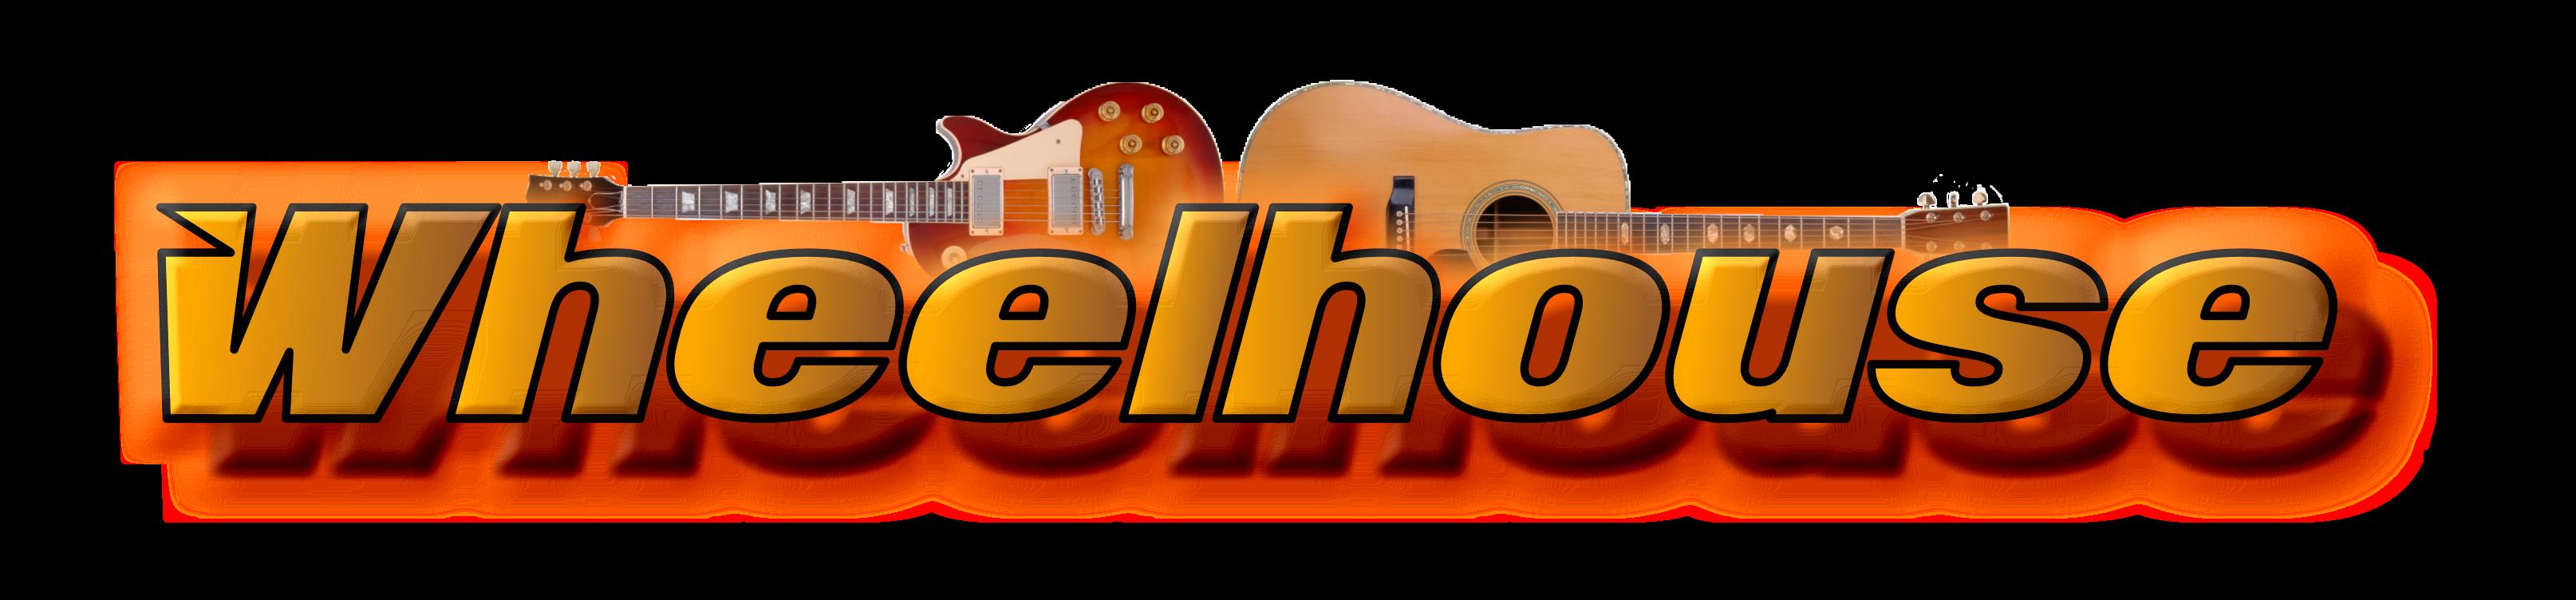 Musician clipart country music. Wheelhouse band clovis california